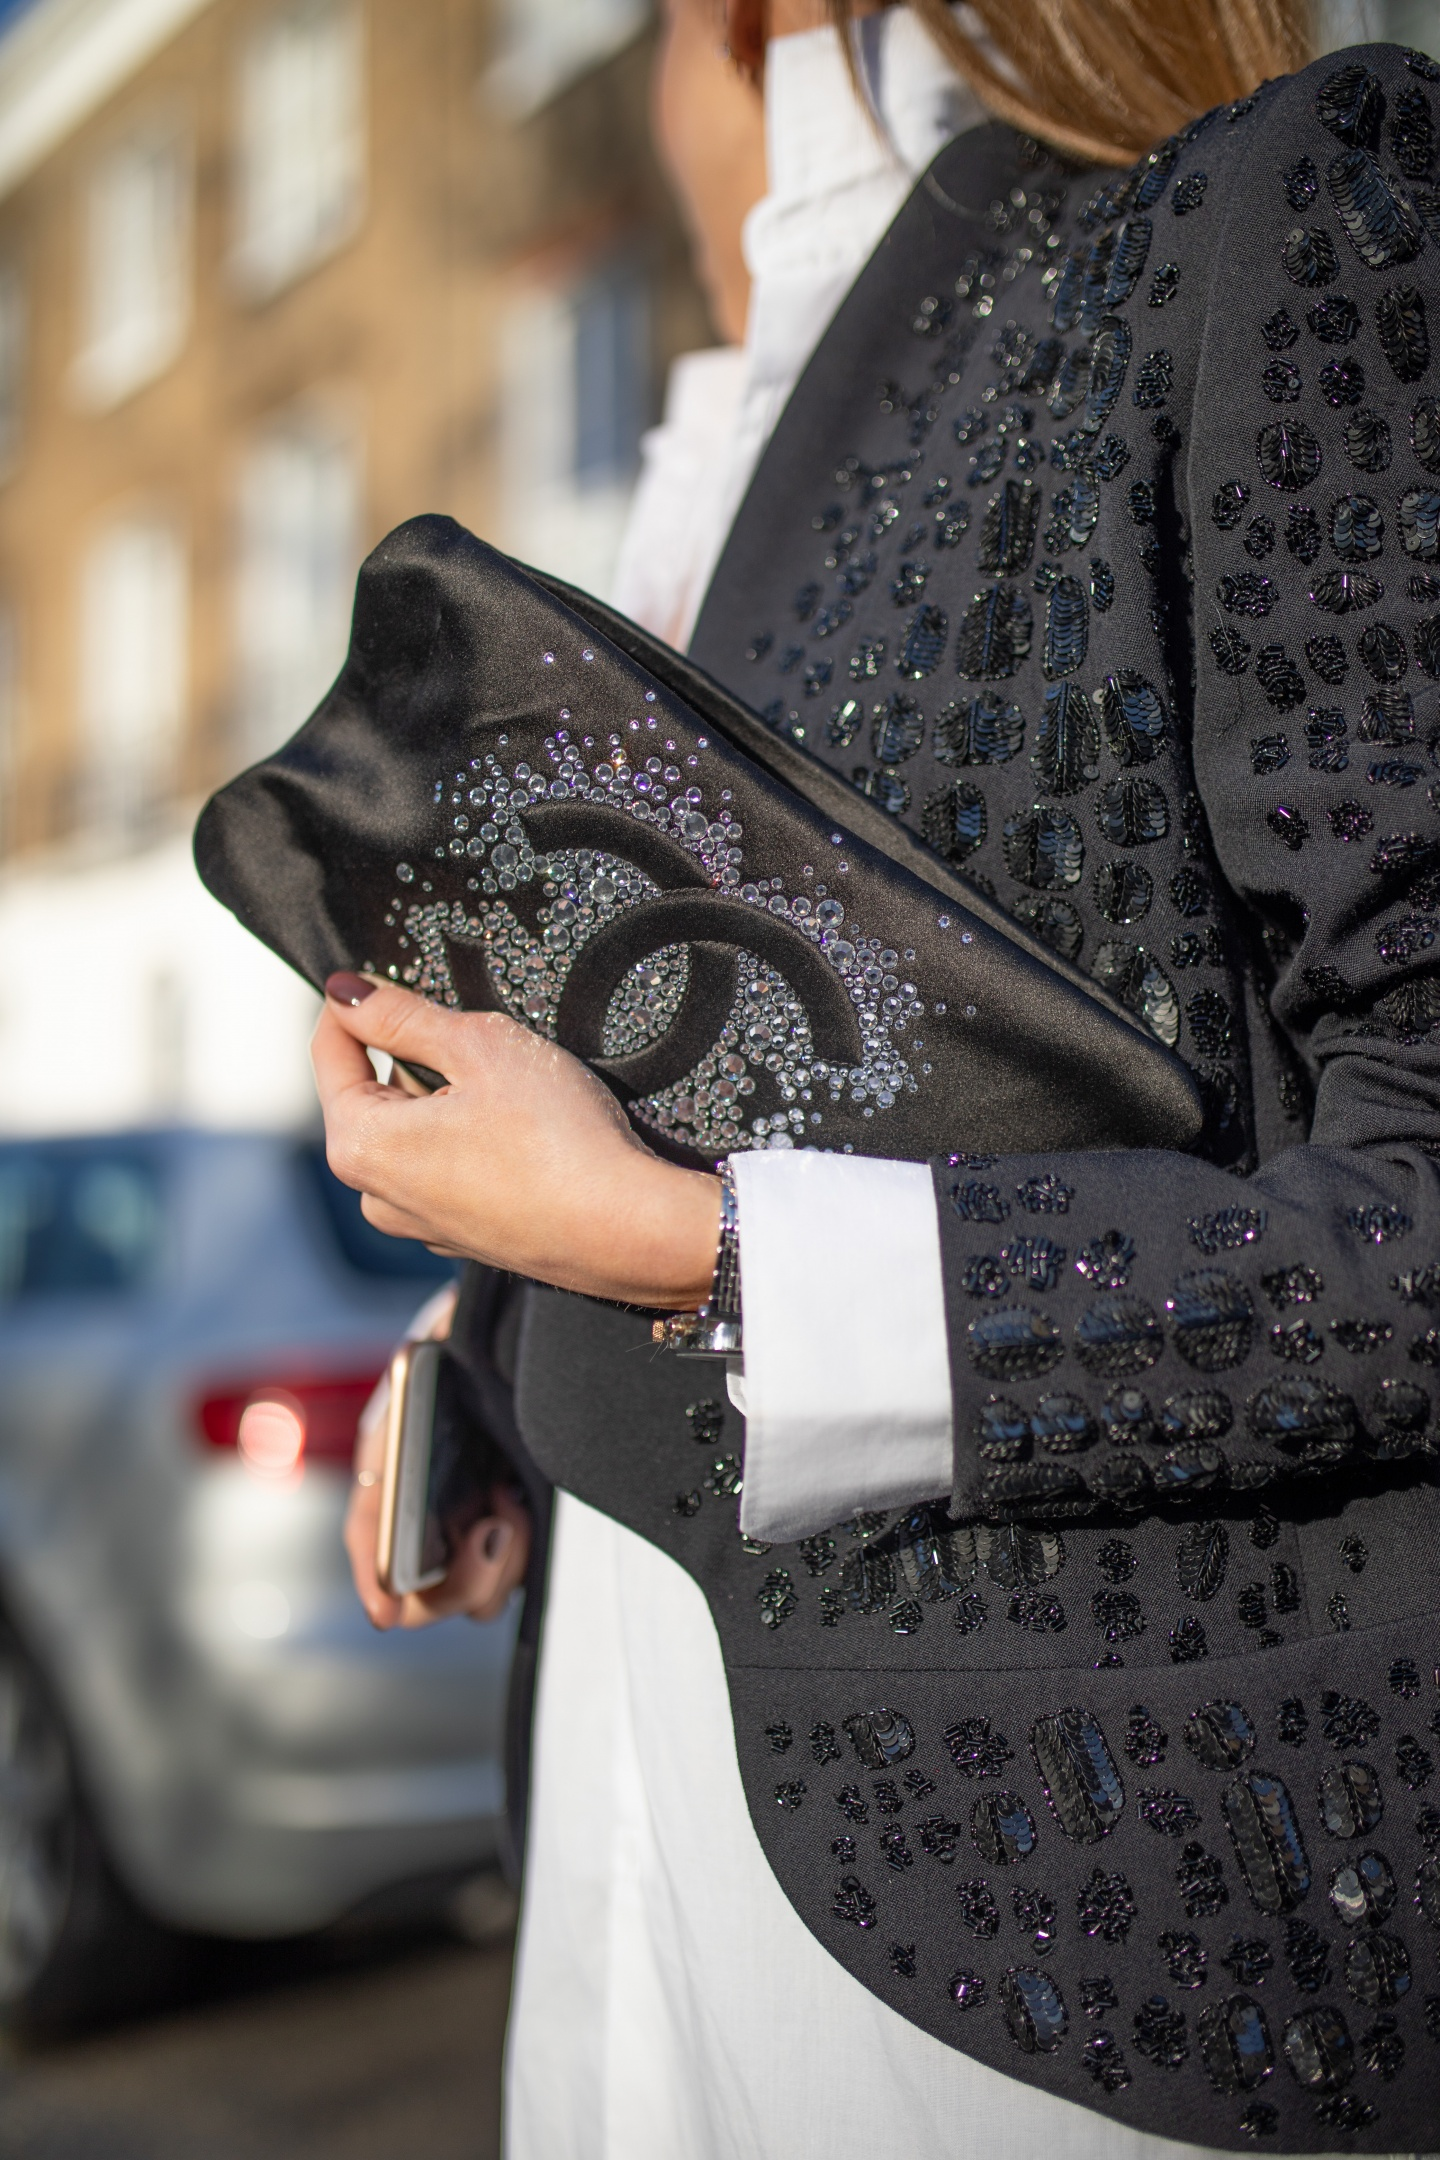 london fashion week, lfw, london fashion week street style, fashion, ss19, celine, emilio pucci, chanel